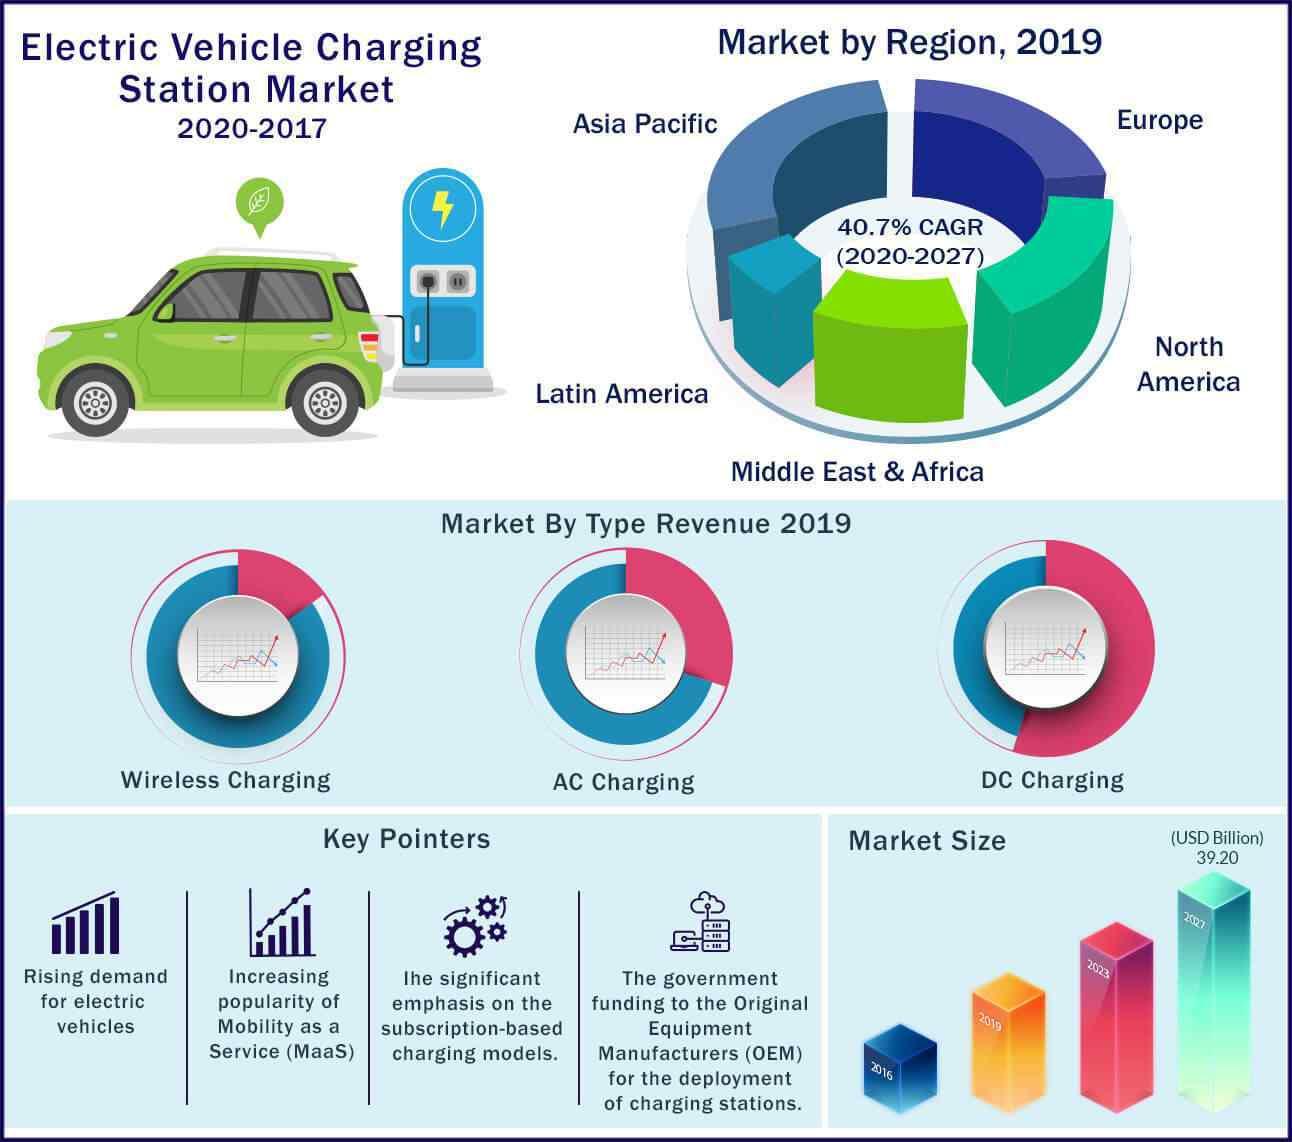 Global Electric Vehicle Charging Station Market 2020-2027